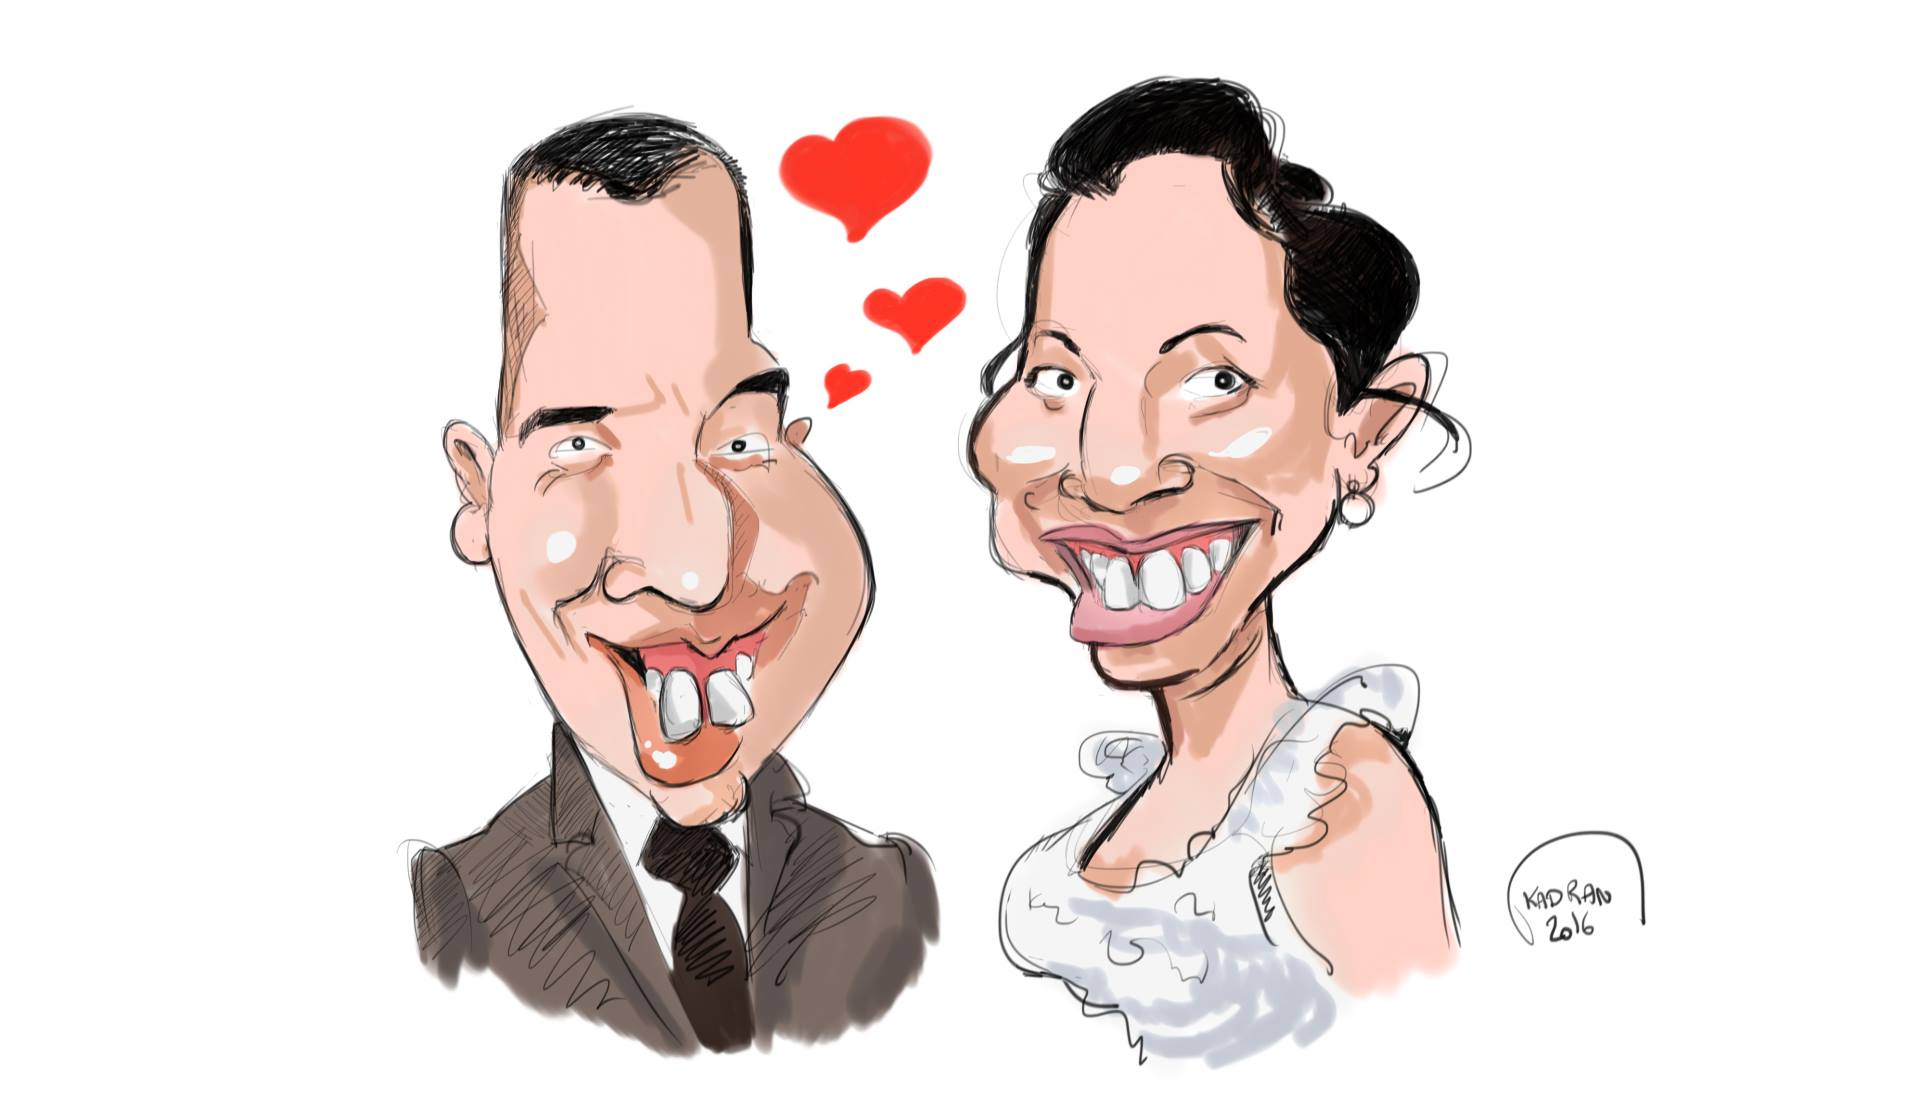 mariage en caricatures d 39 elodie et alain marolles les braults 72. Black Bedroom Furniture Sets. Home Design Ideas